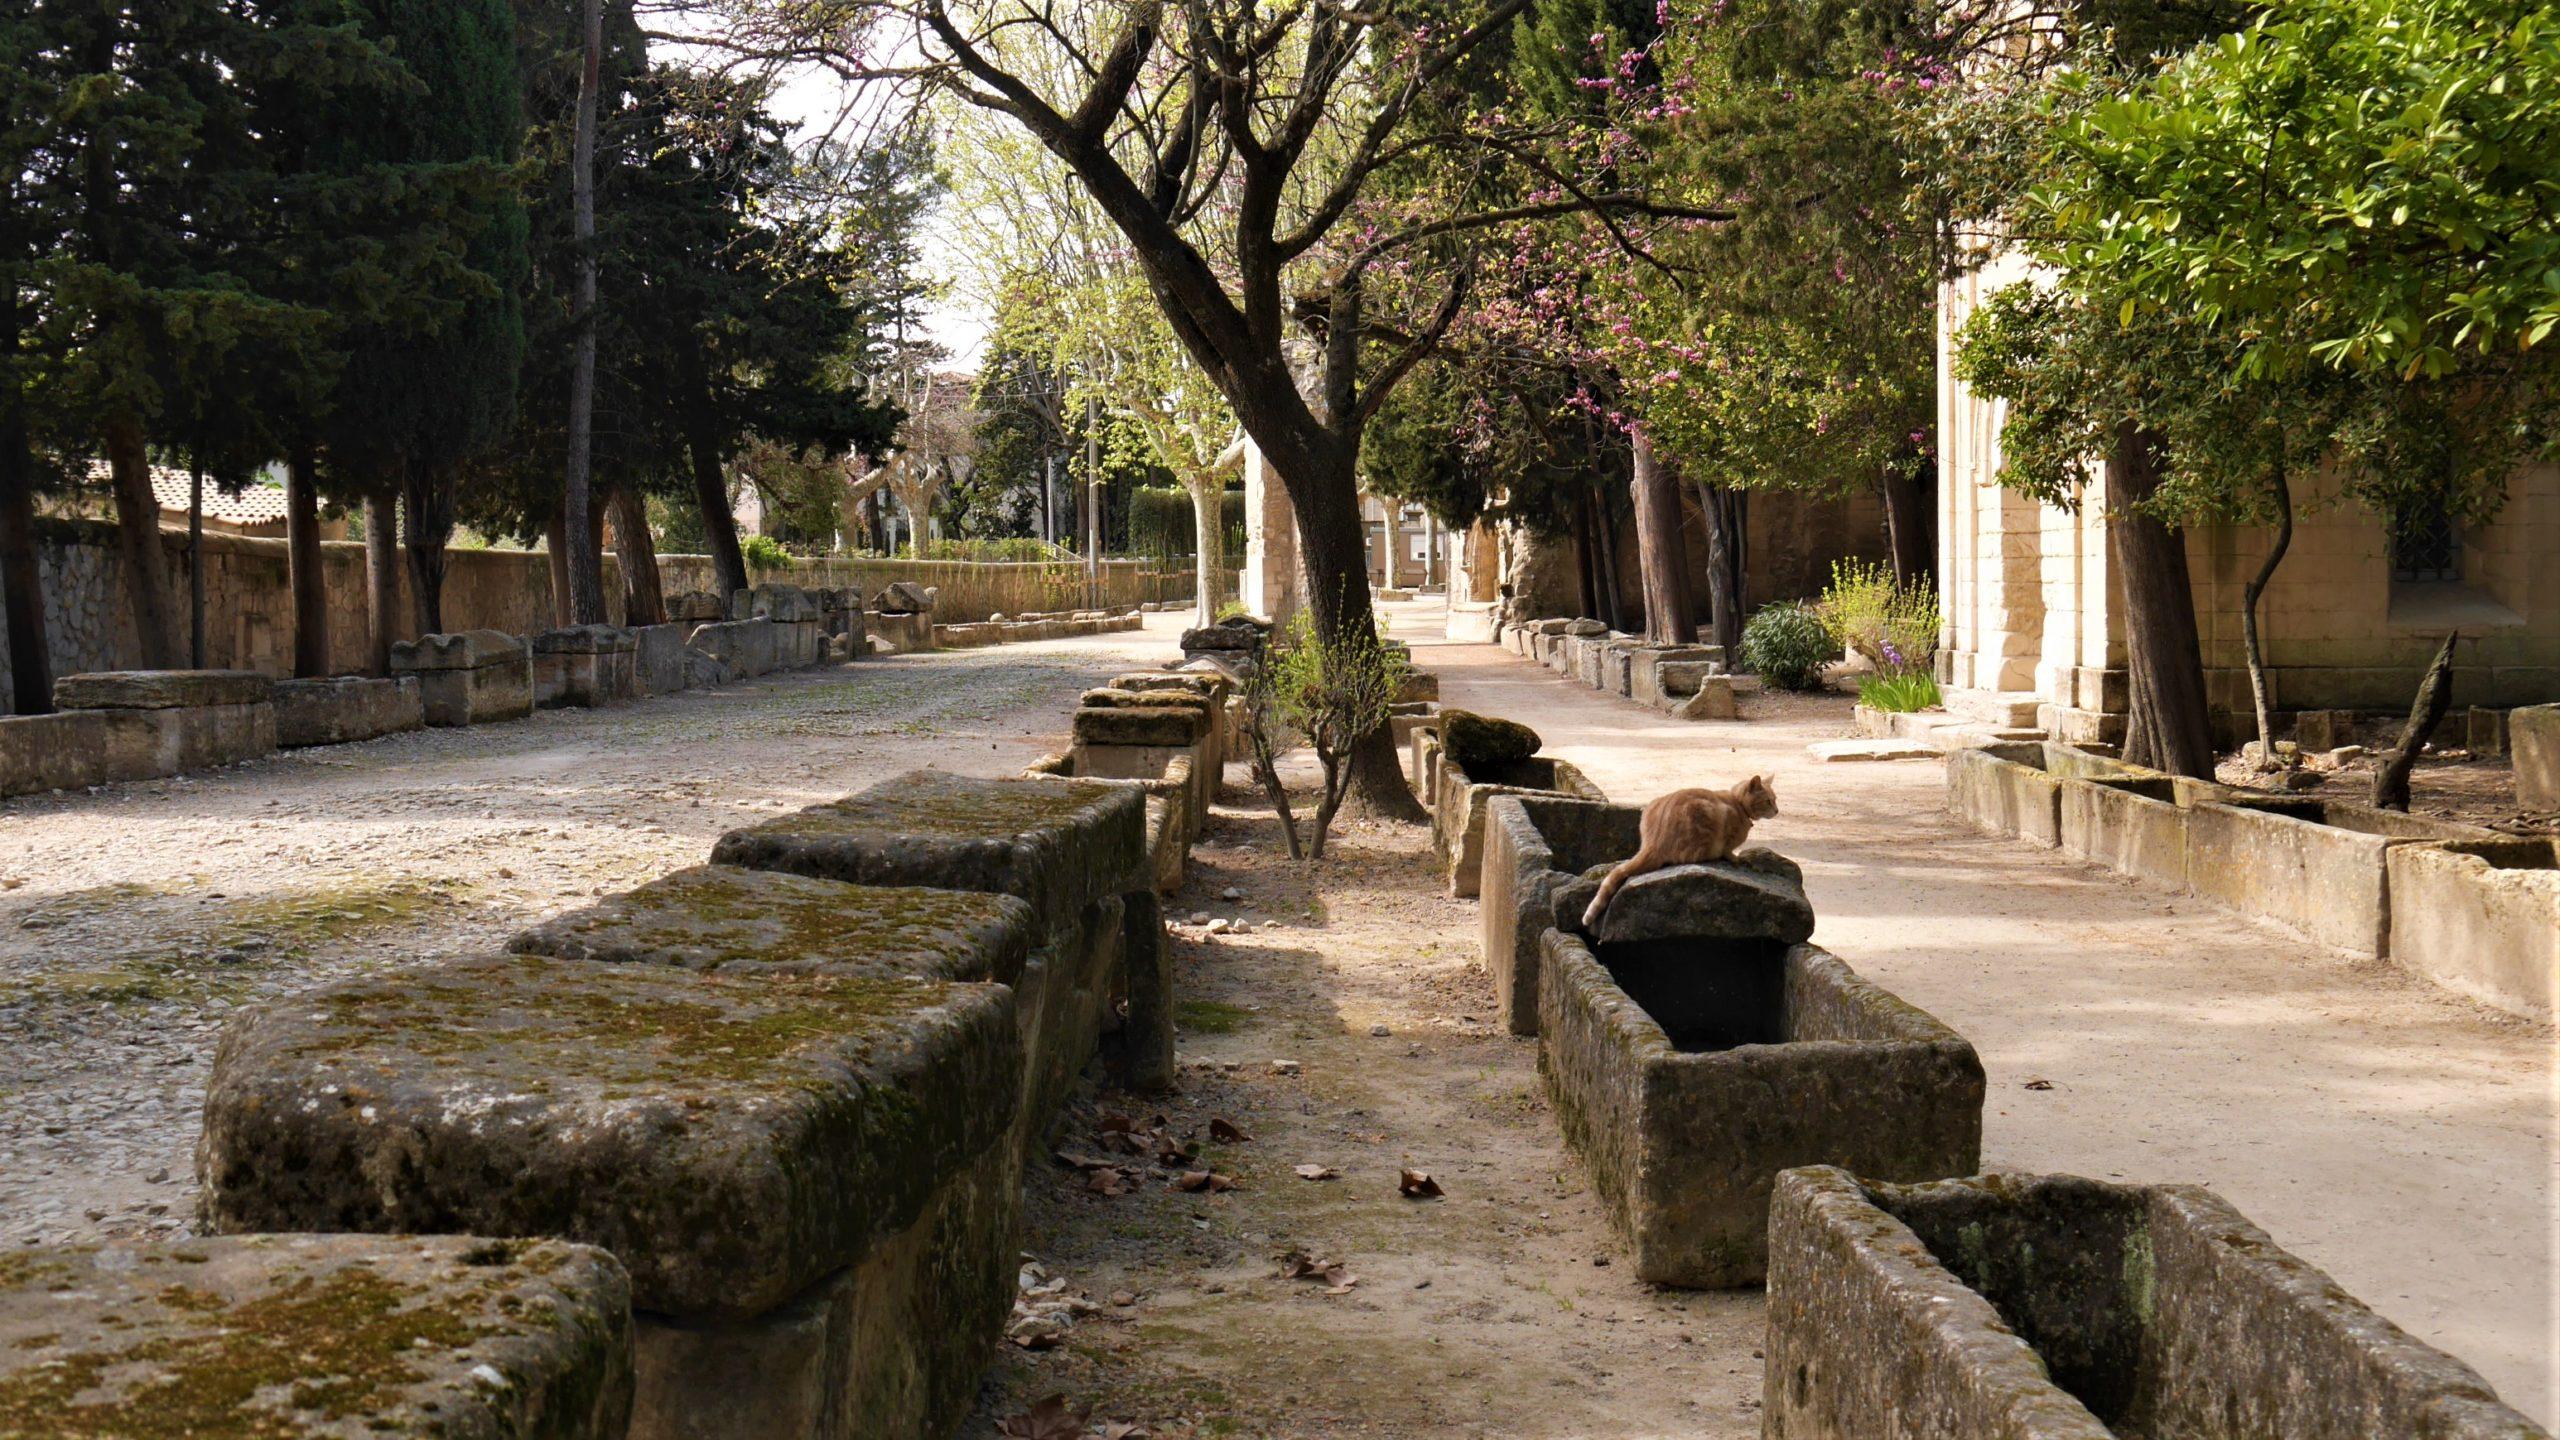 Arles Alyscamps itineraire visite centre-ville blog voyage france arpenter le chemin